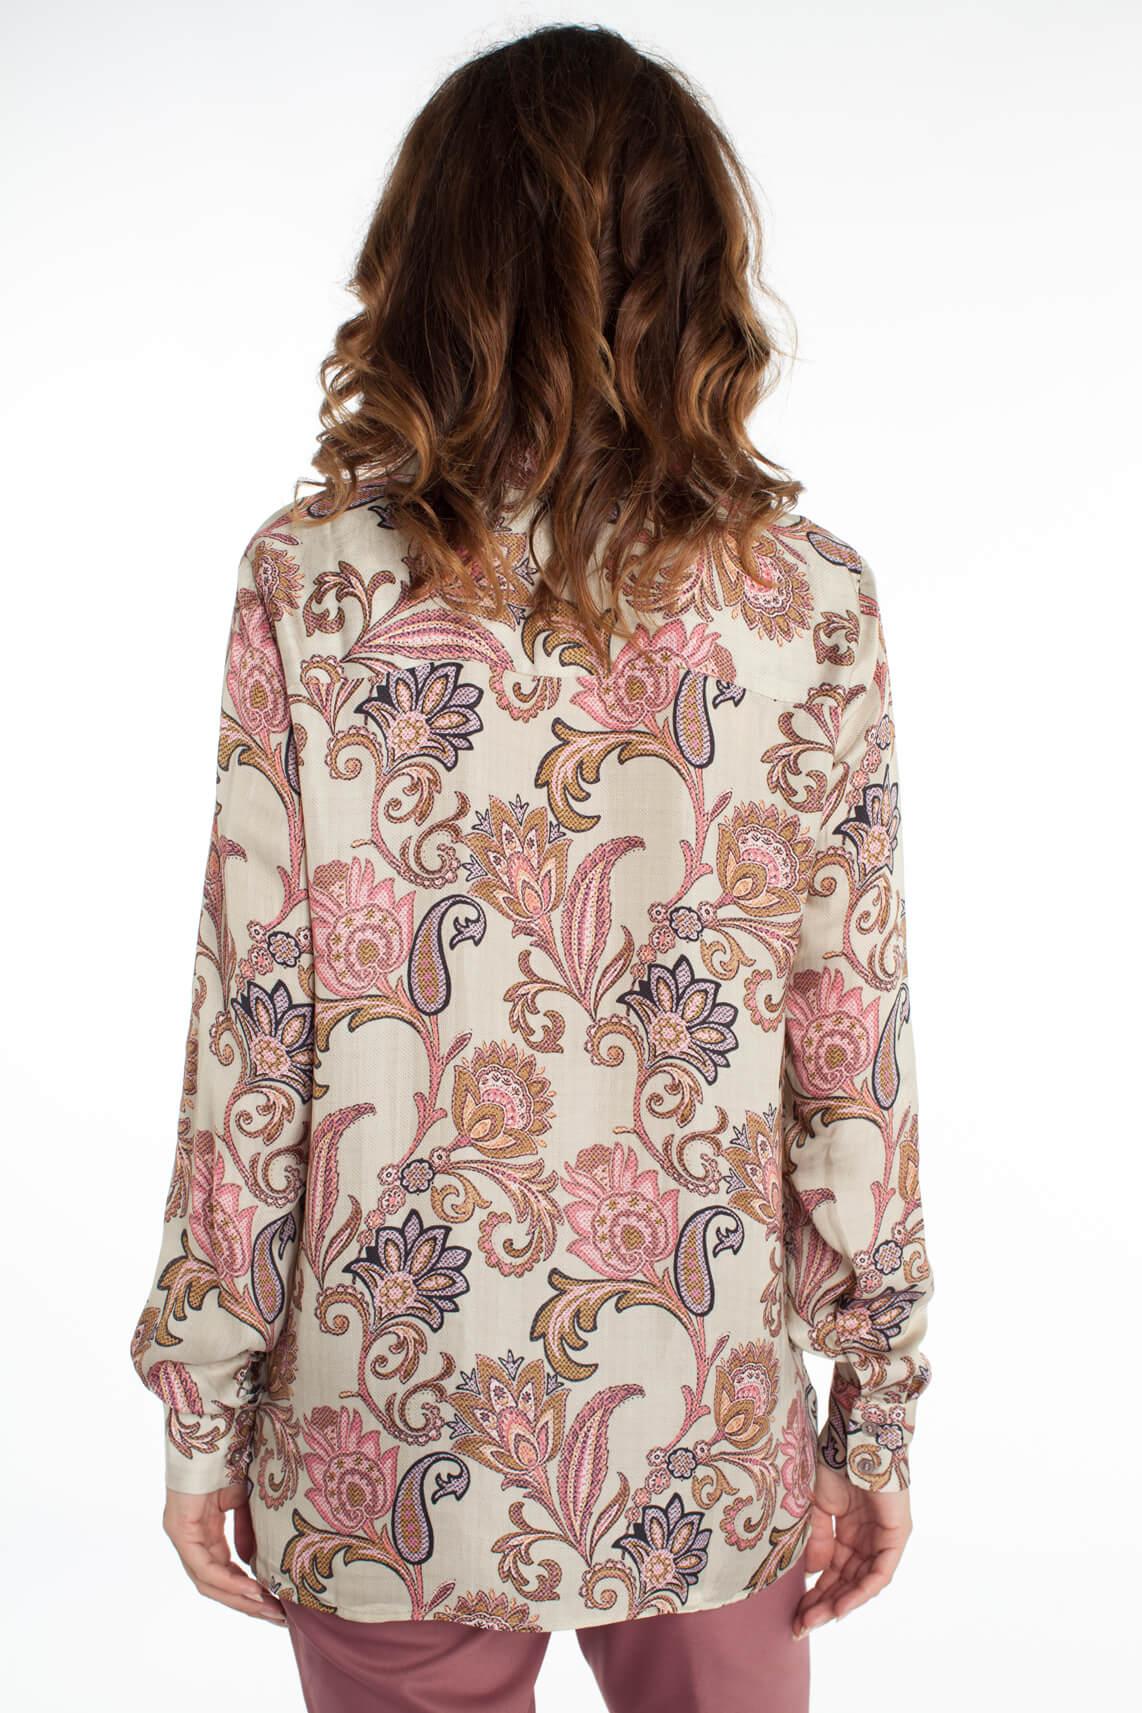 Mos Mosh Dames Taylor geprinte blouse roze